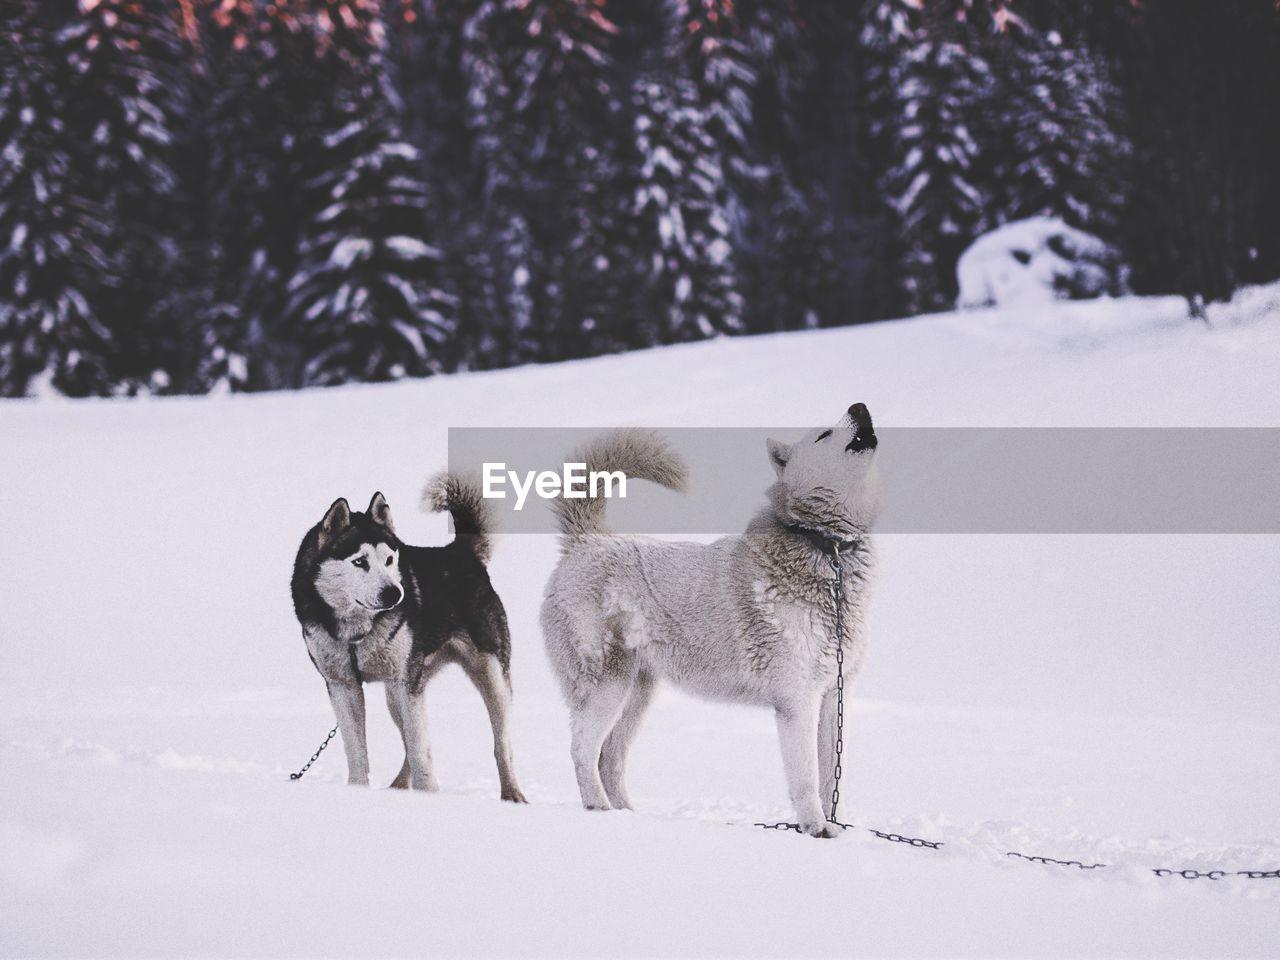 Husky Dogs On Snow Covered Landscape